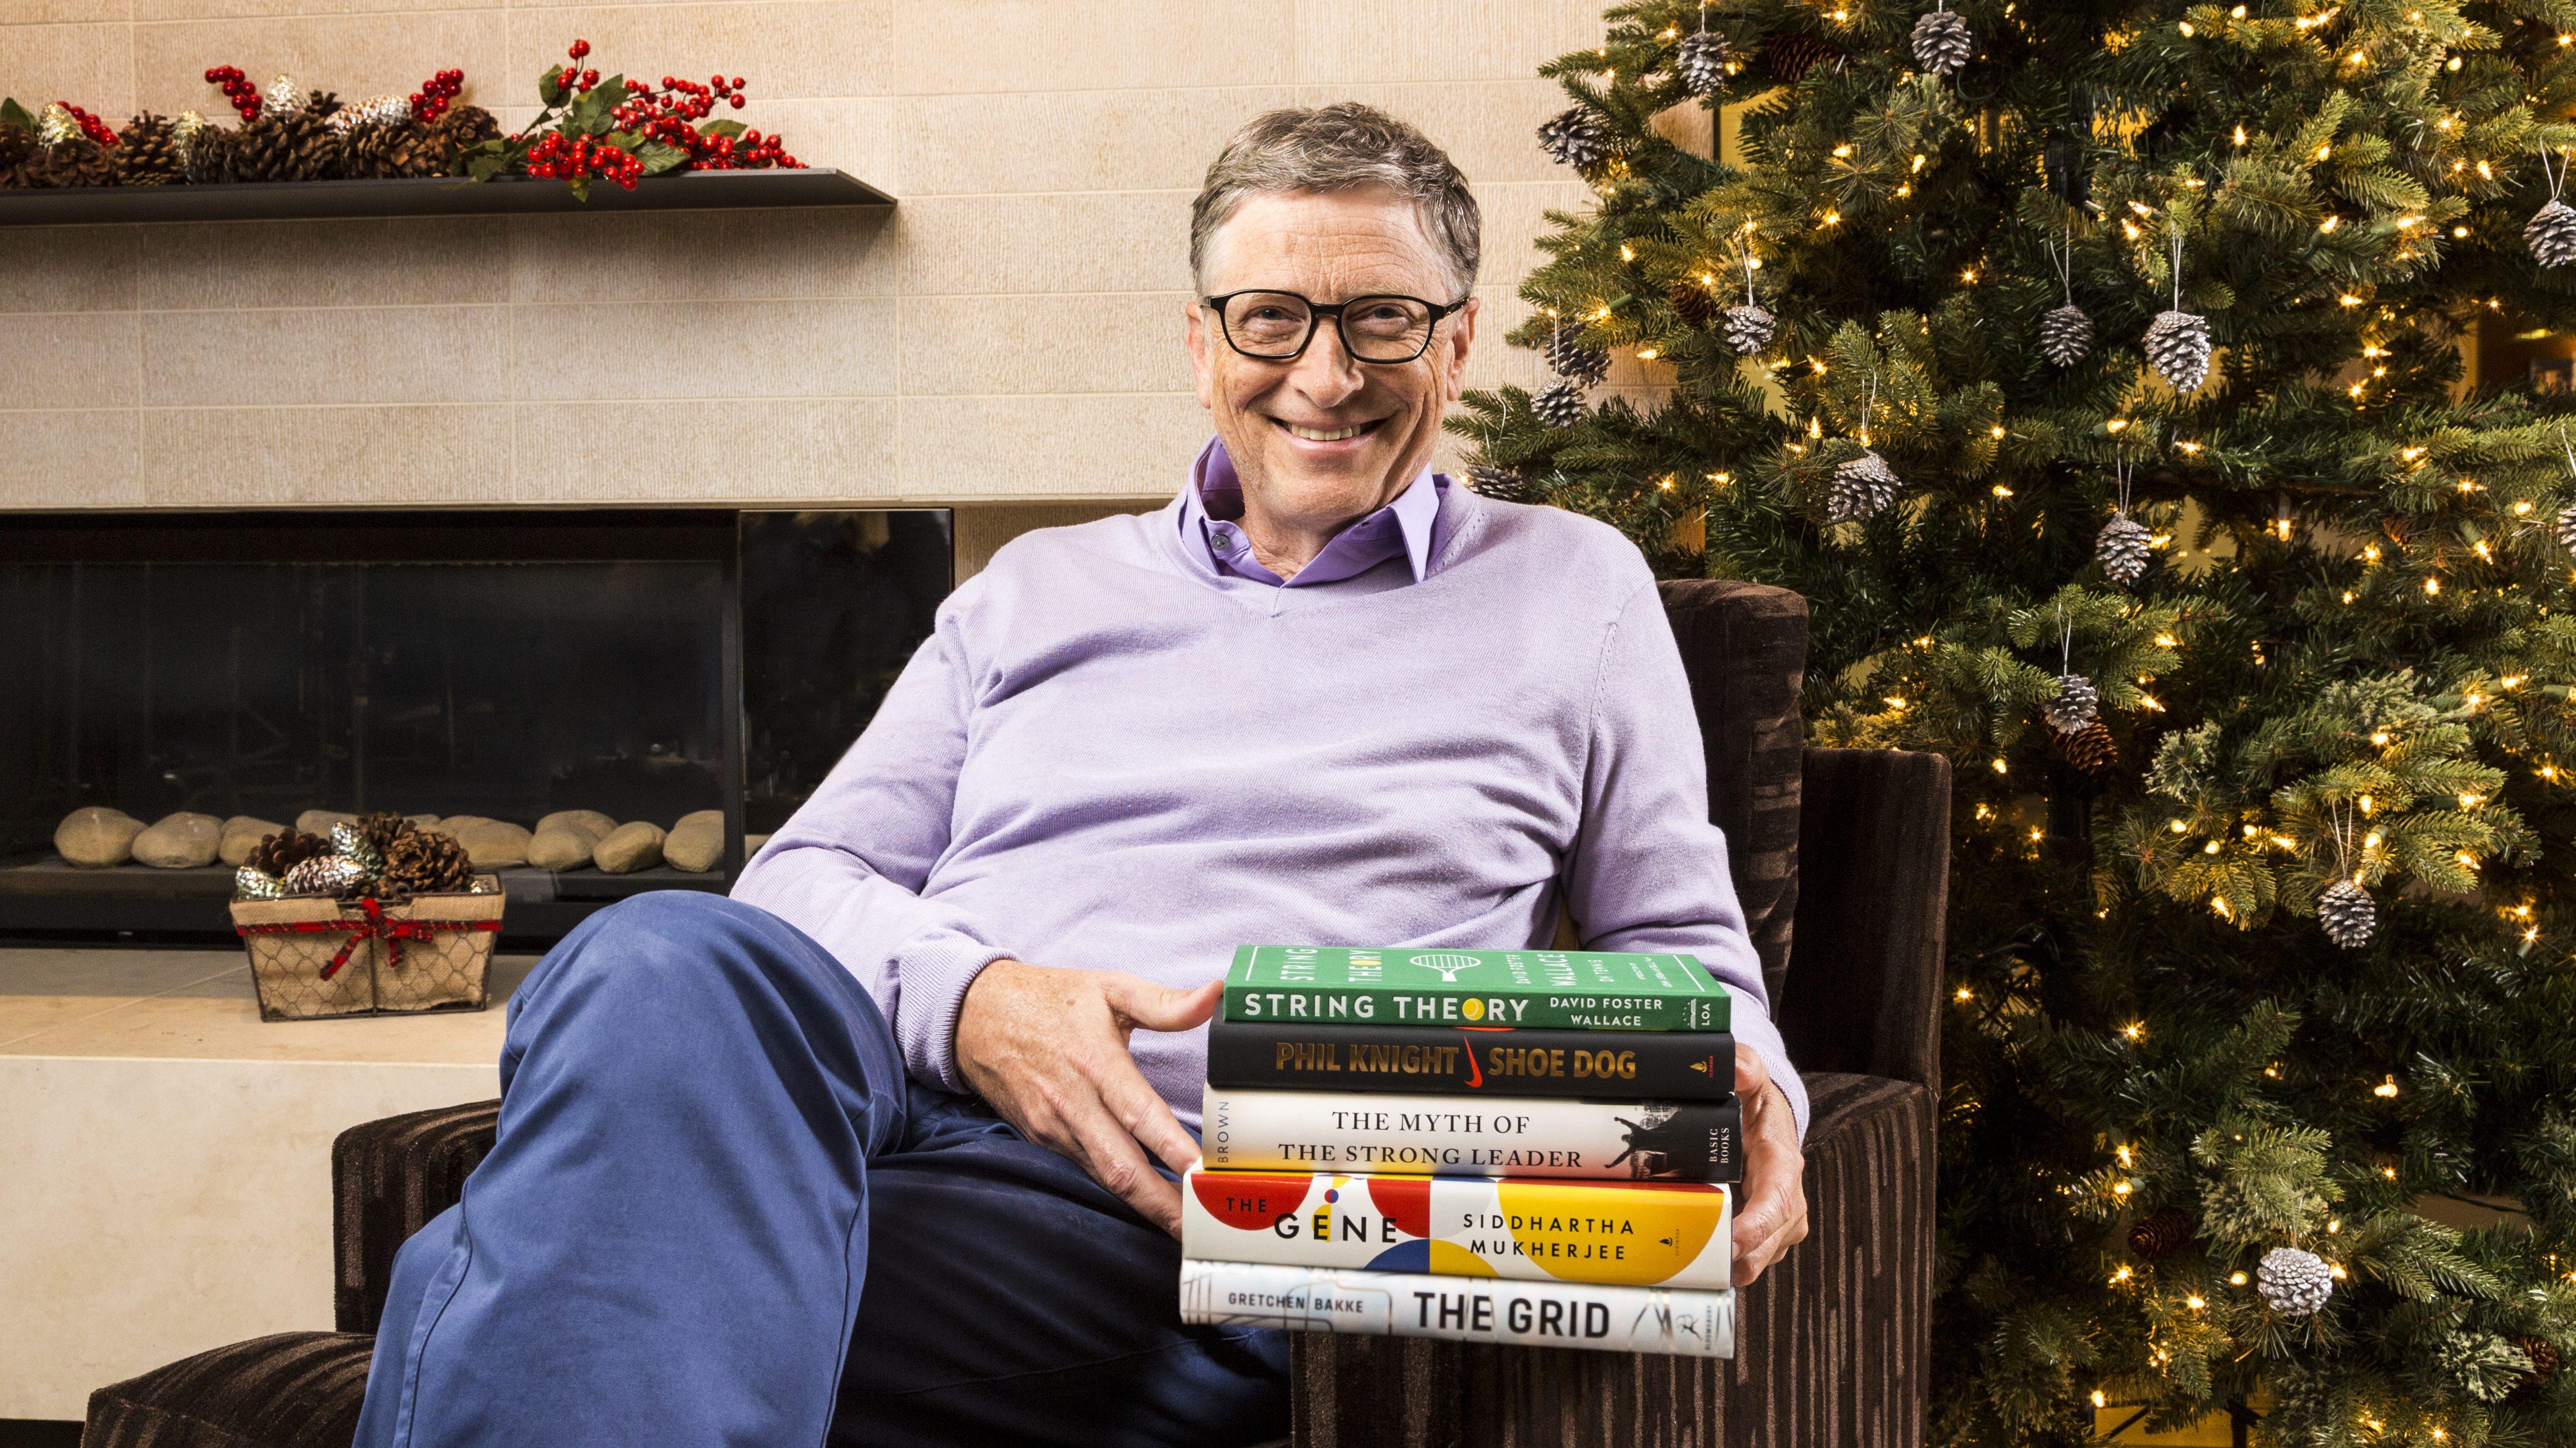 bill gates reading books 2016